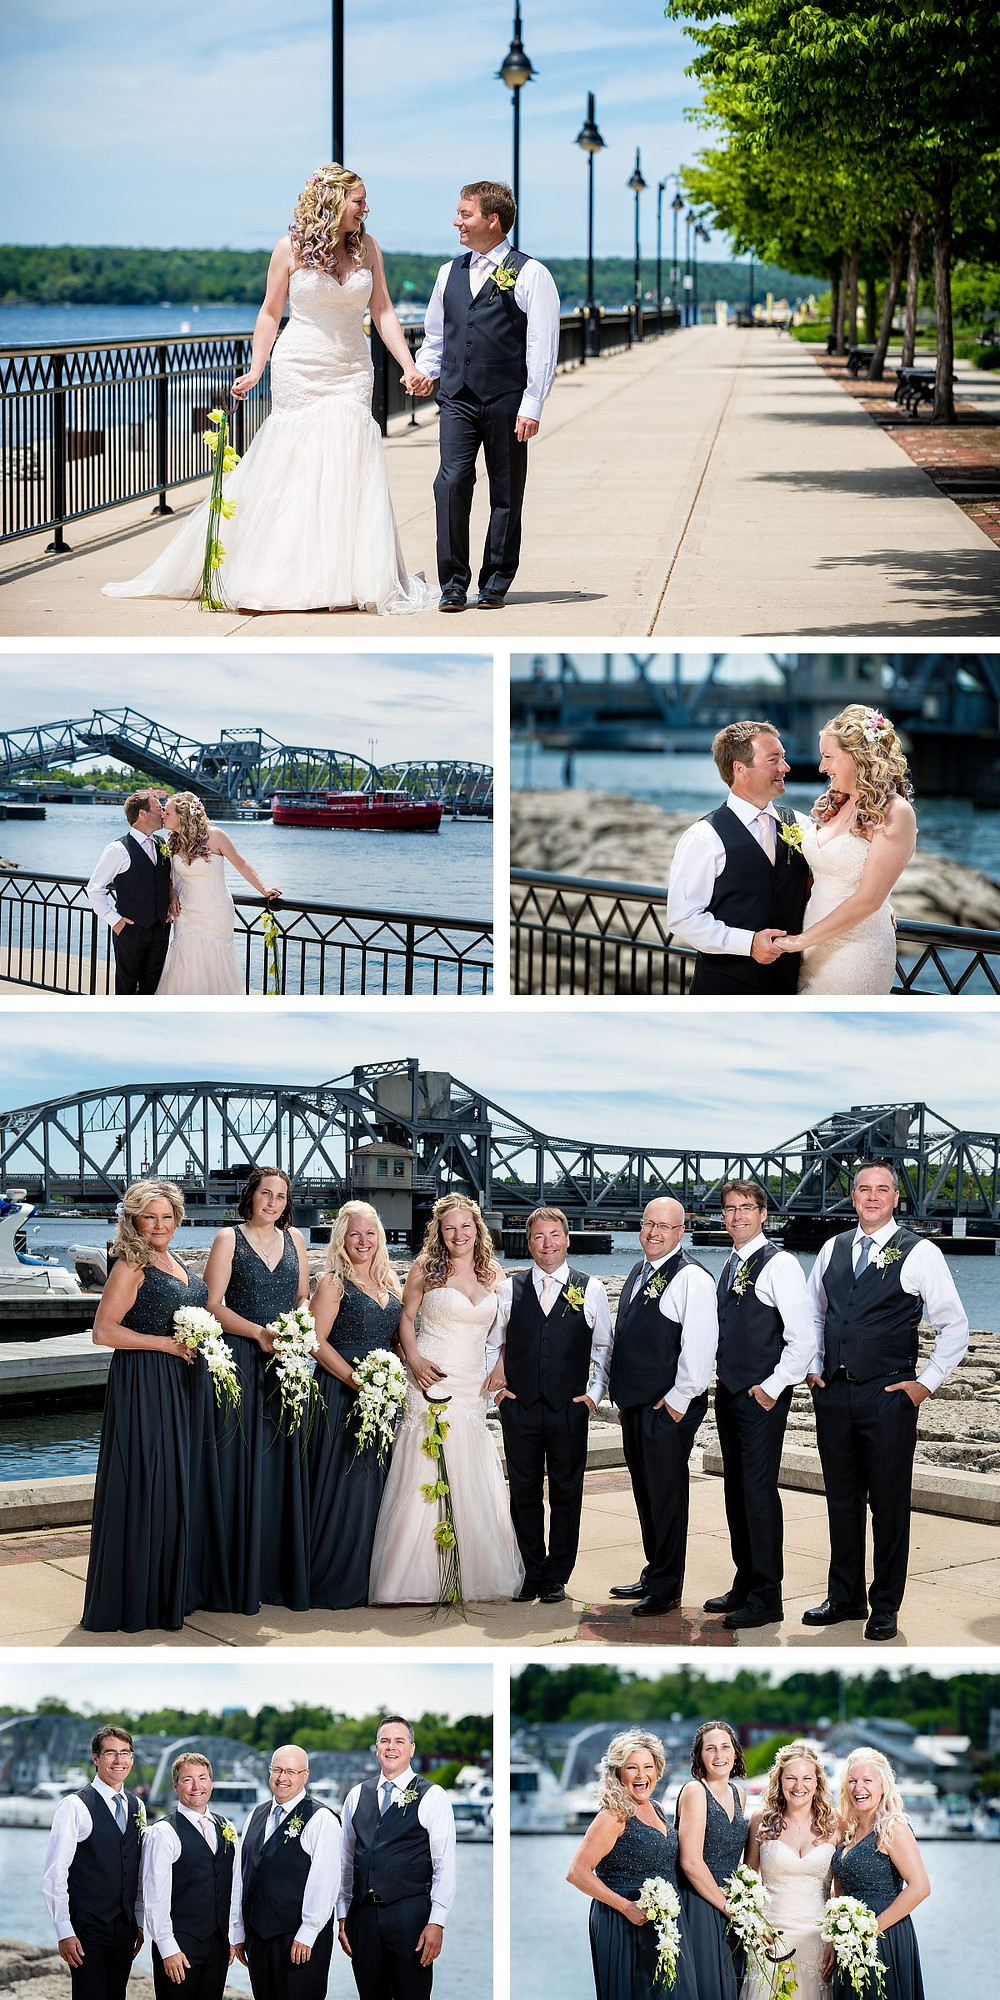 Stone Harbor Door County Wedding Photographer Lanari Photography